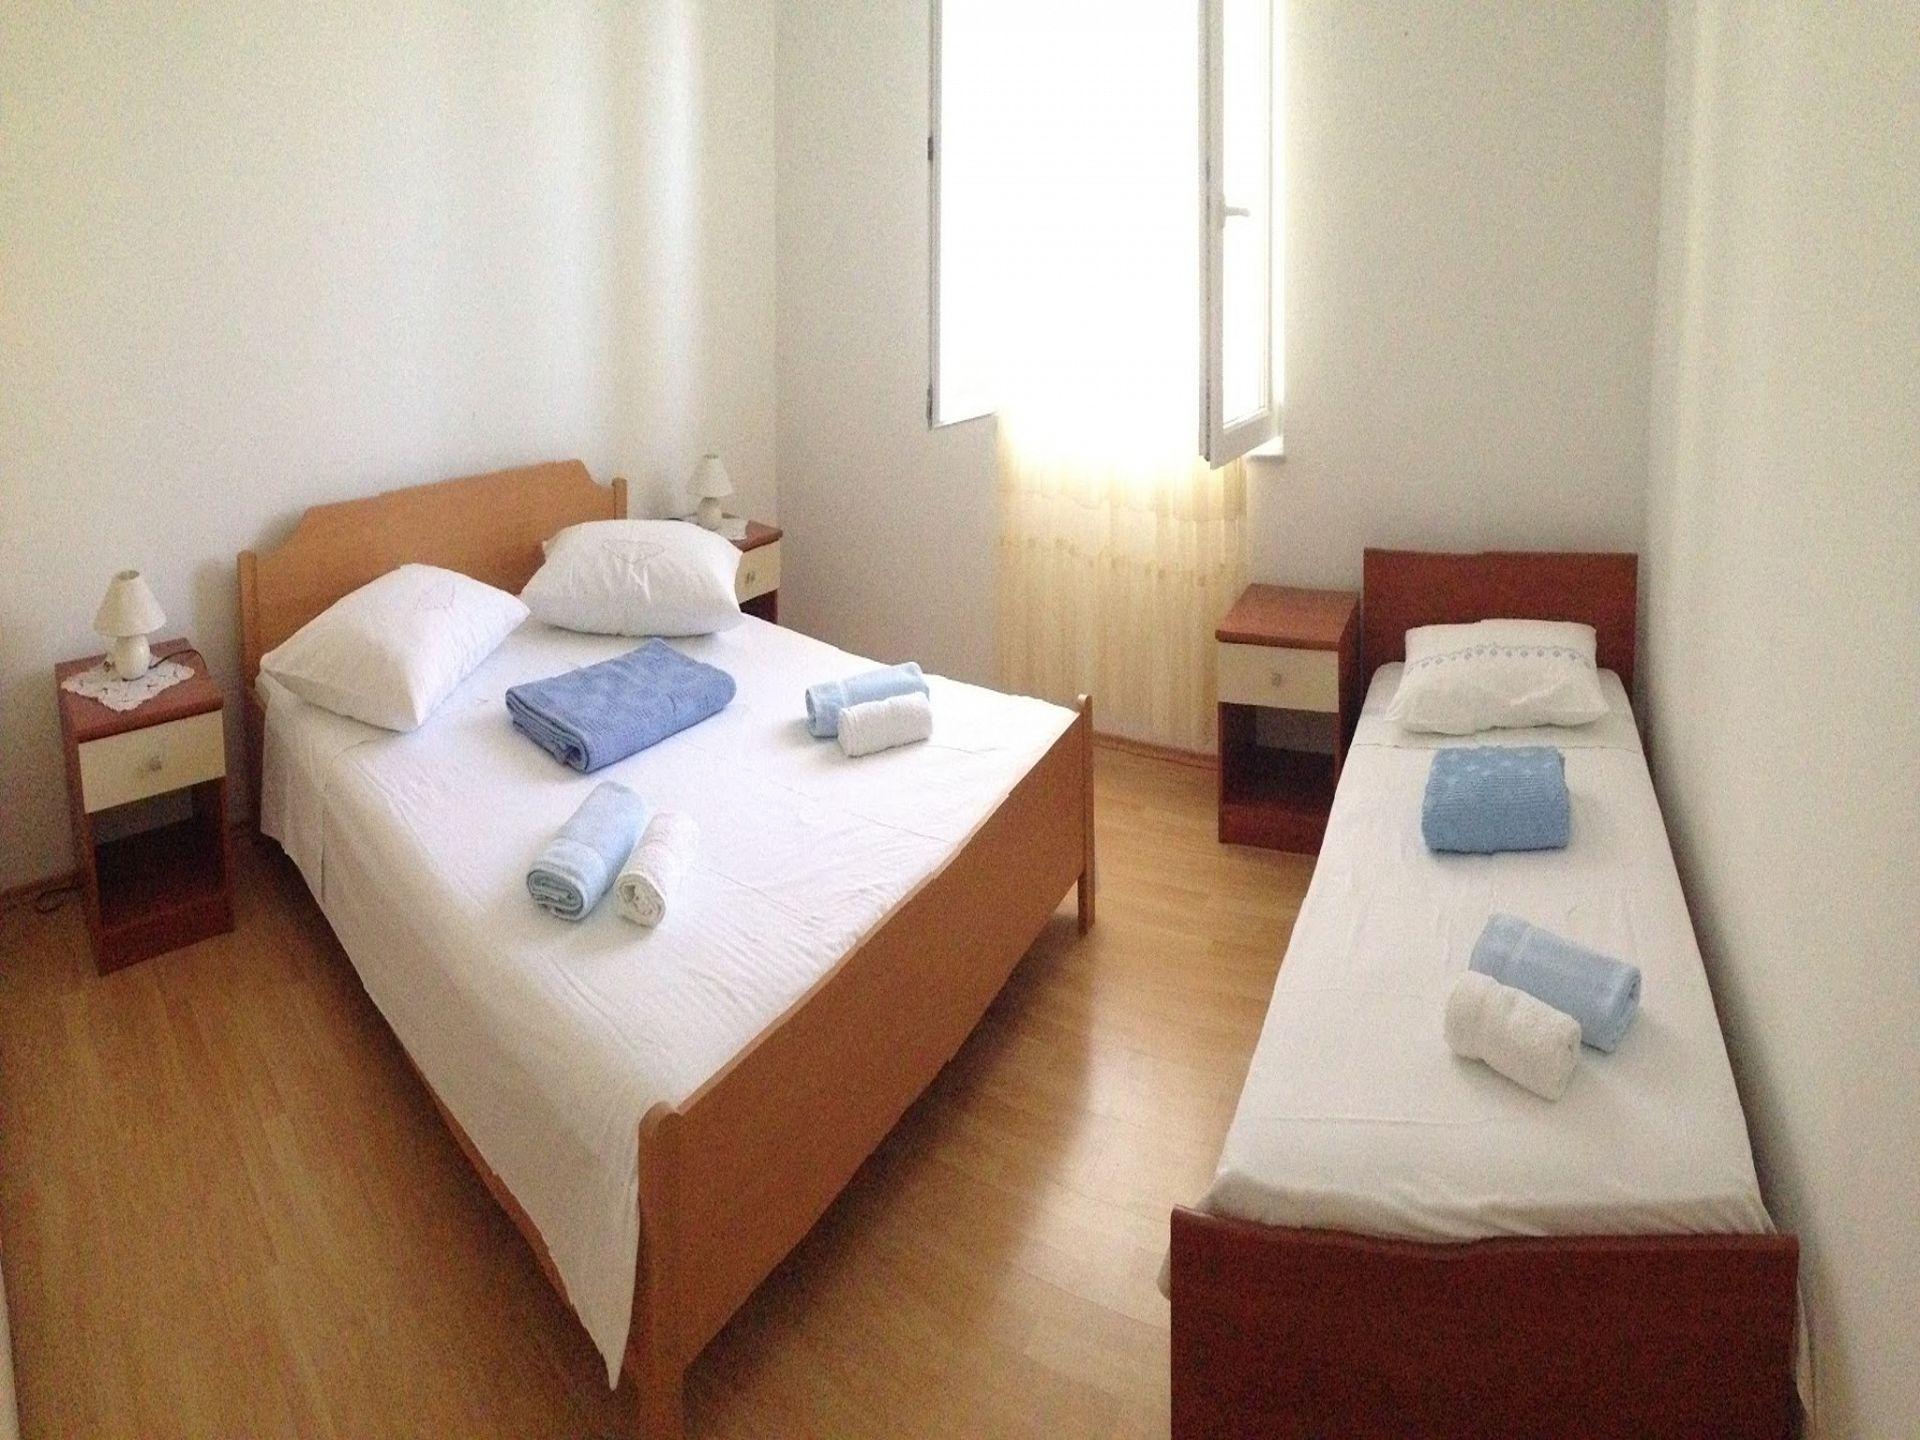 Apartamente Apartment Mare A1 Dobropoljana, Island Pasman 52684, Dobropoljana, Pašman, Zadarska